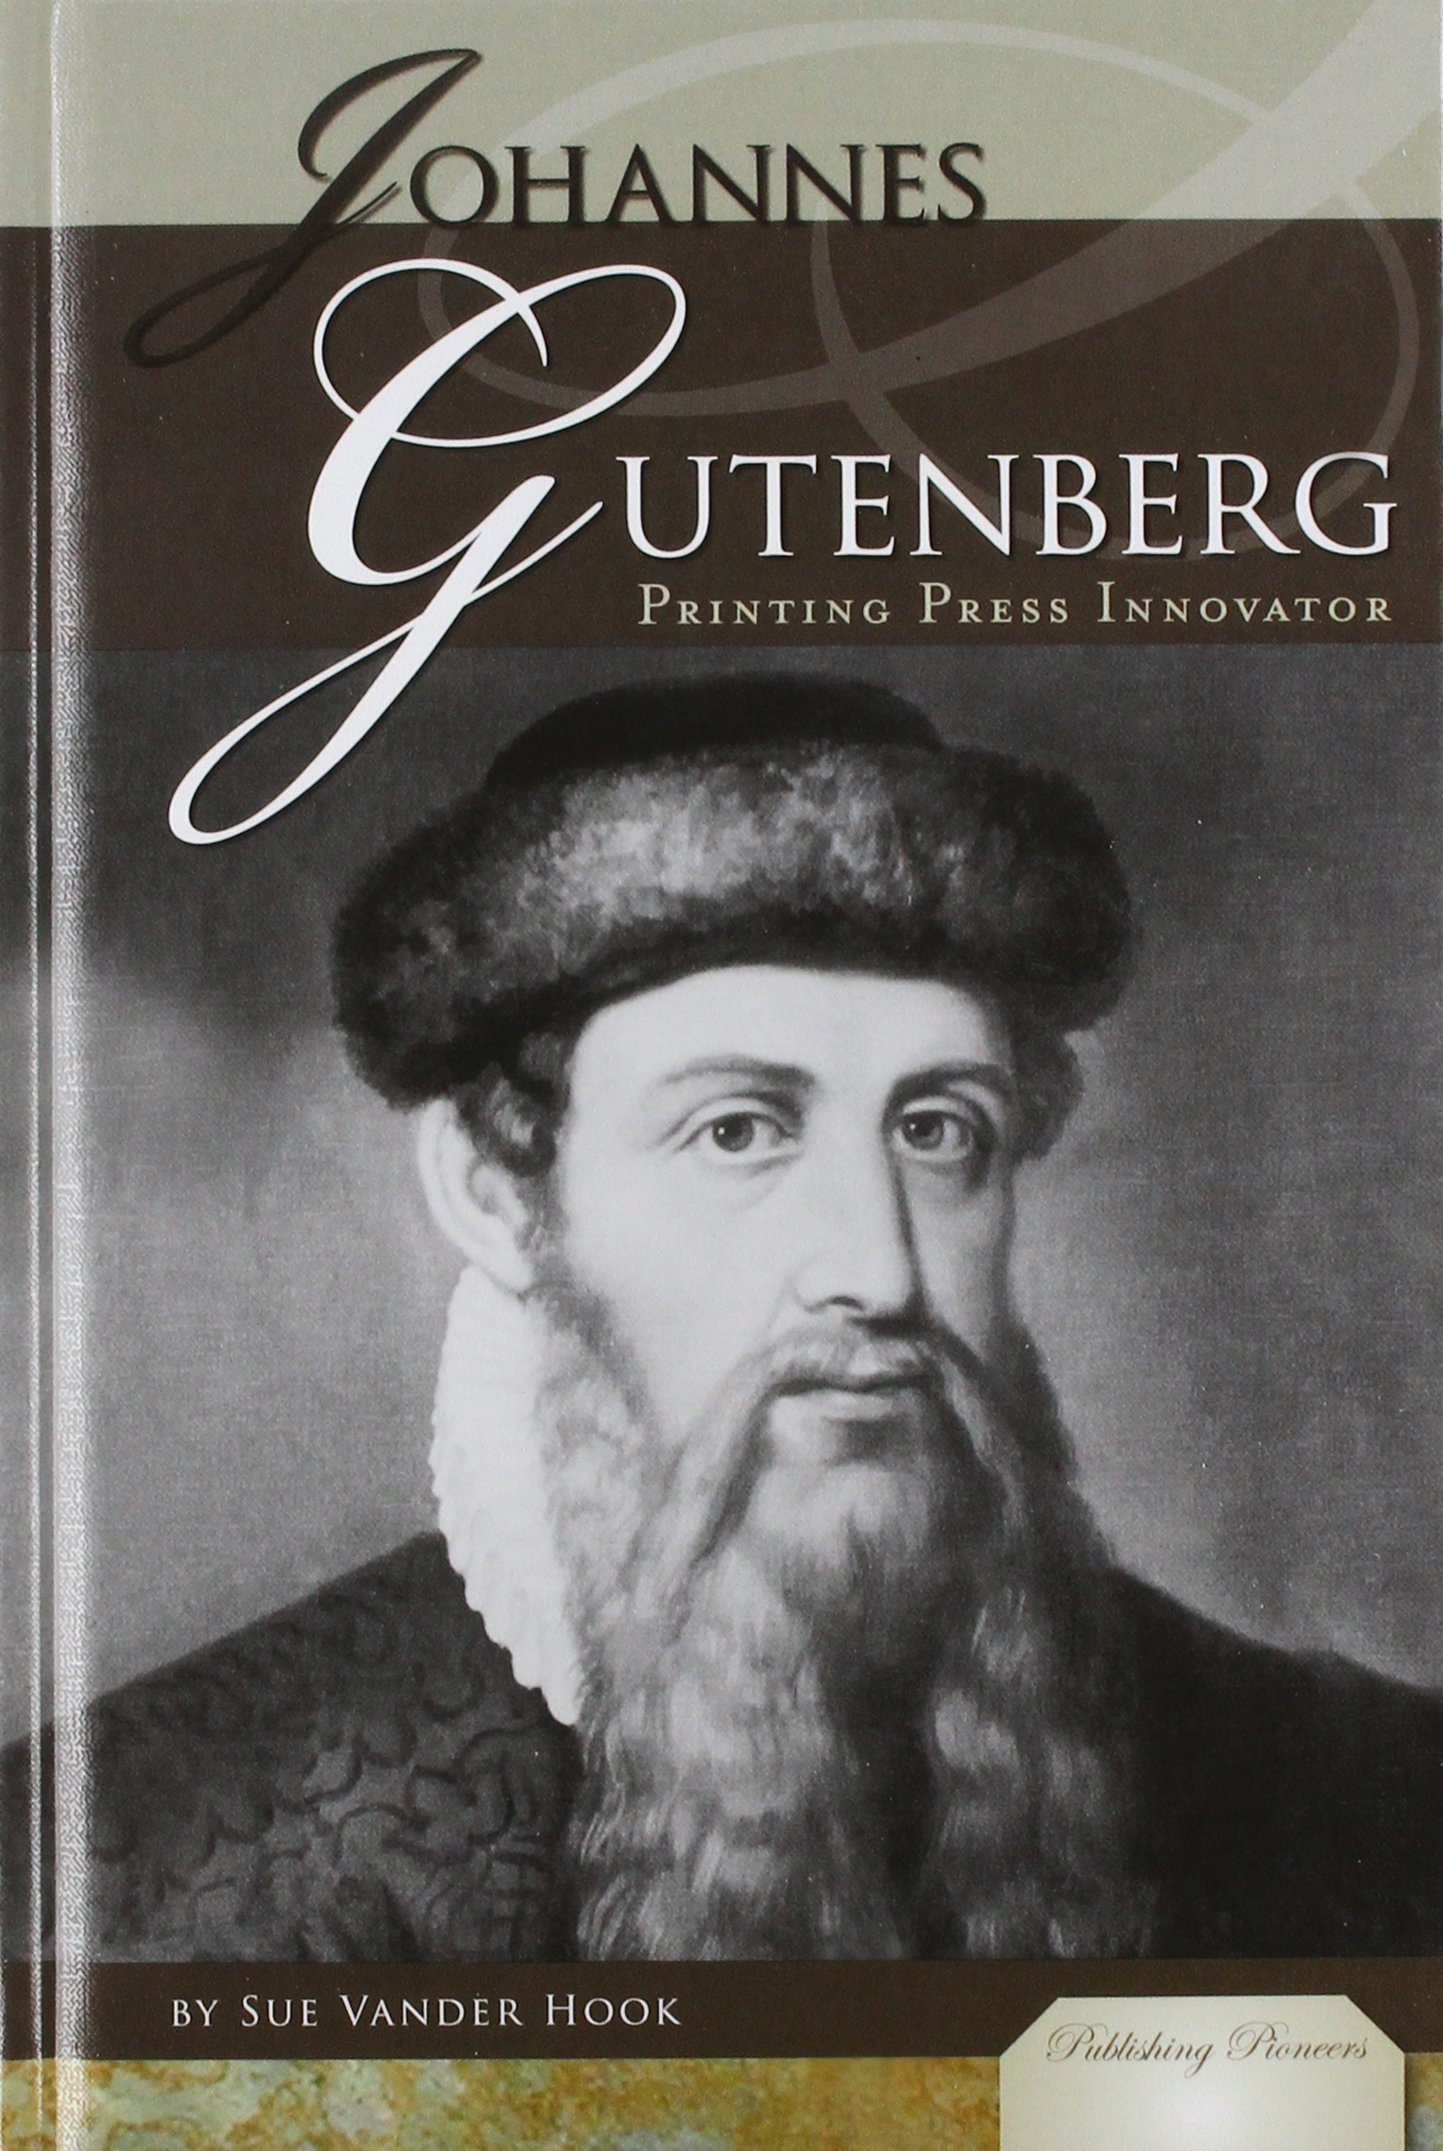 Johannes Gutenberg: Printing Press Innovator (Publishing Pioneers) ebook